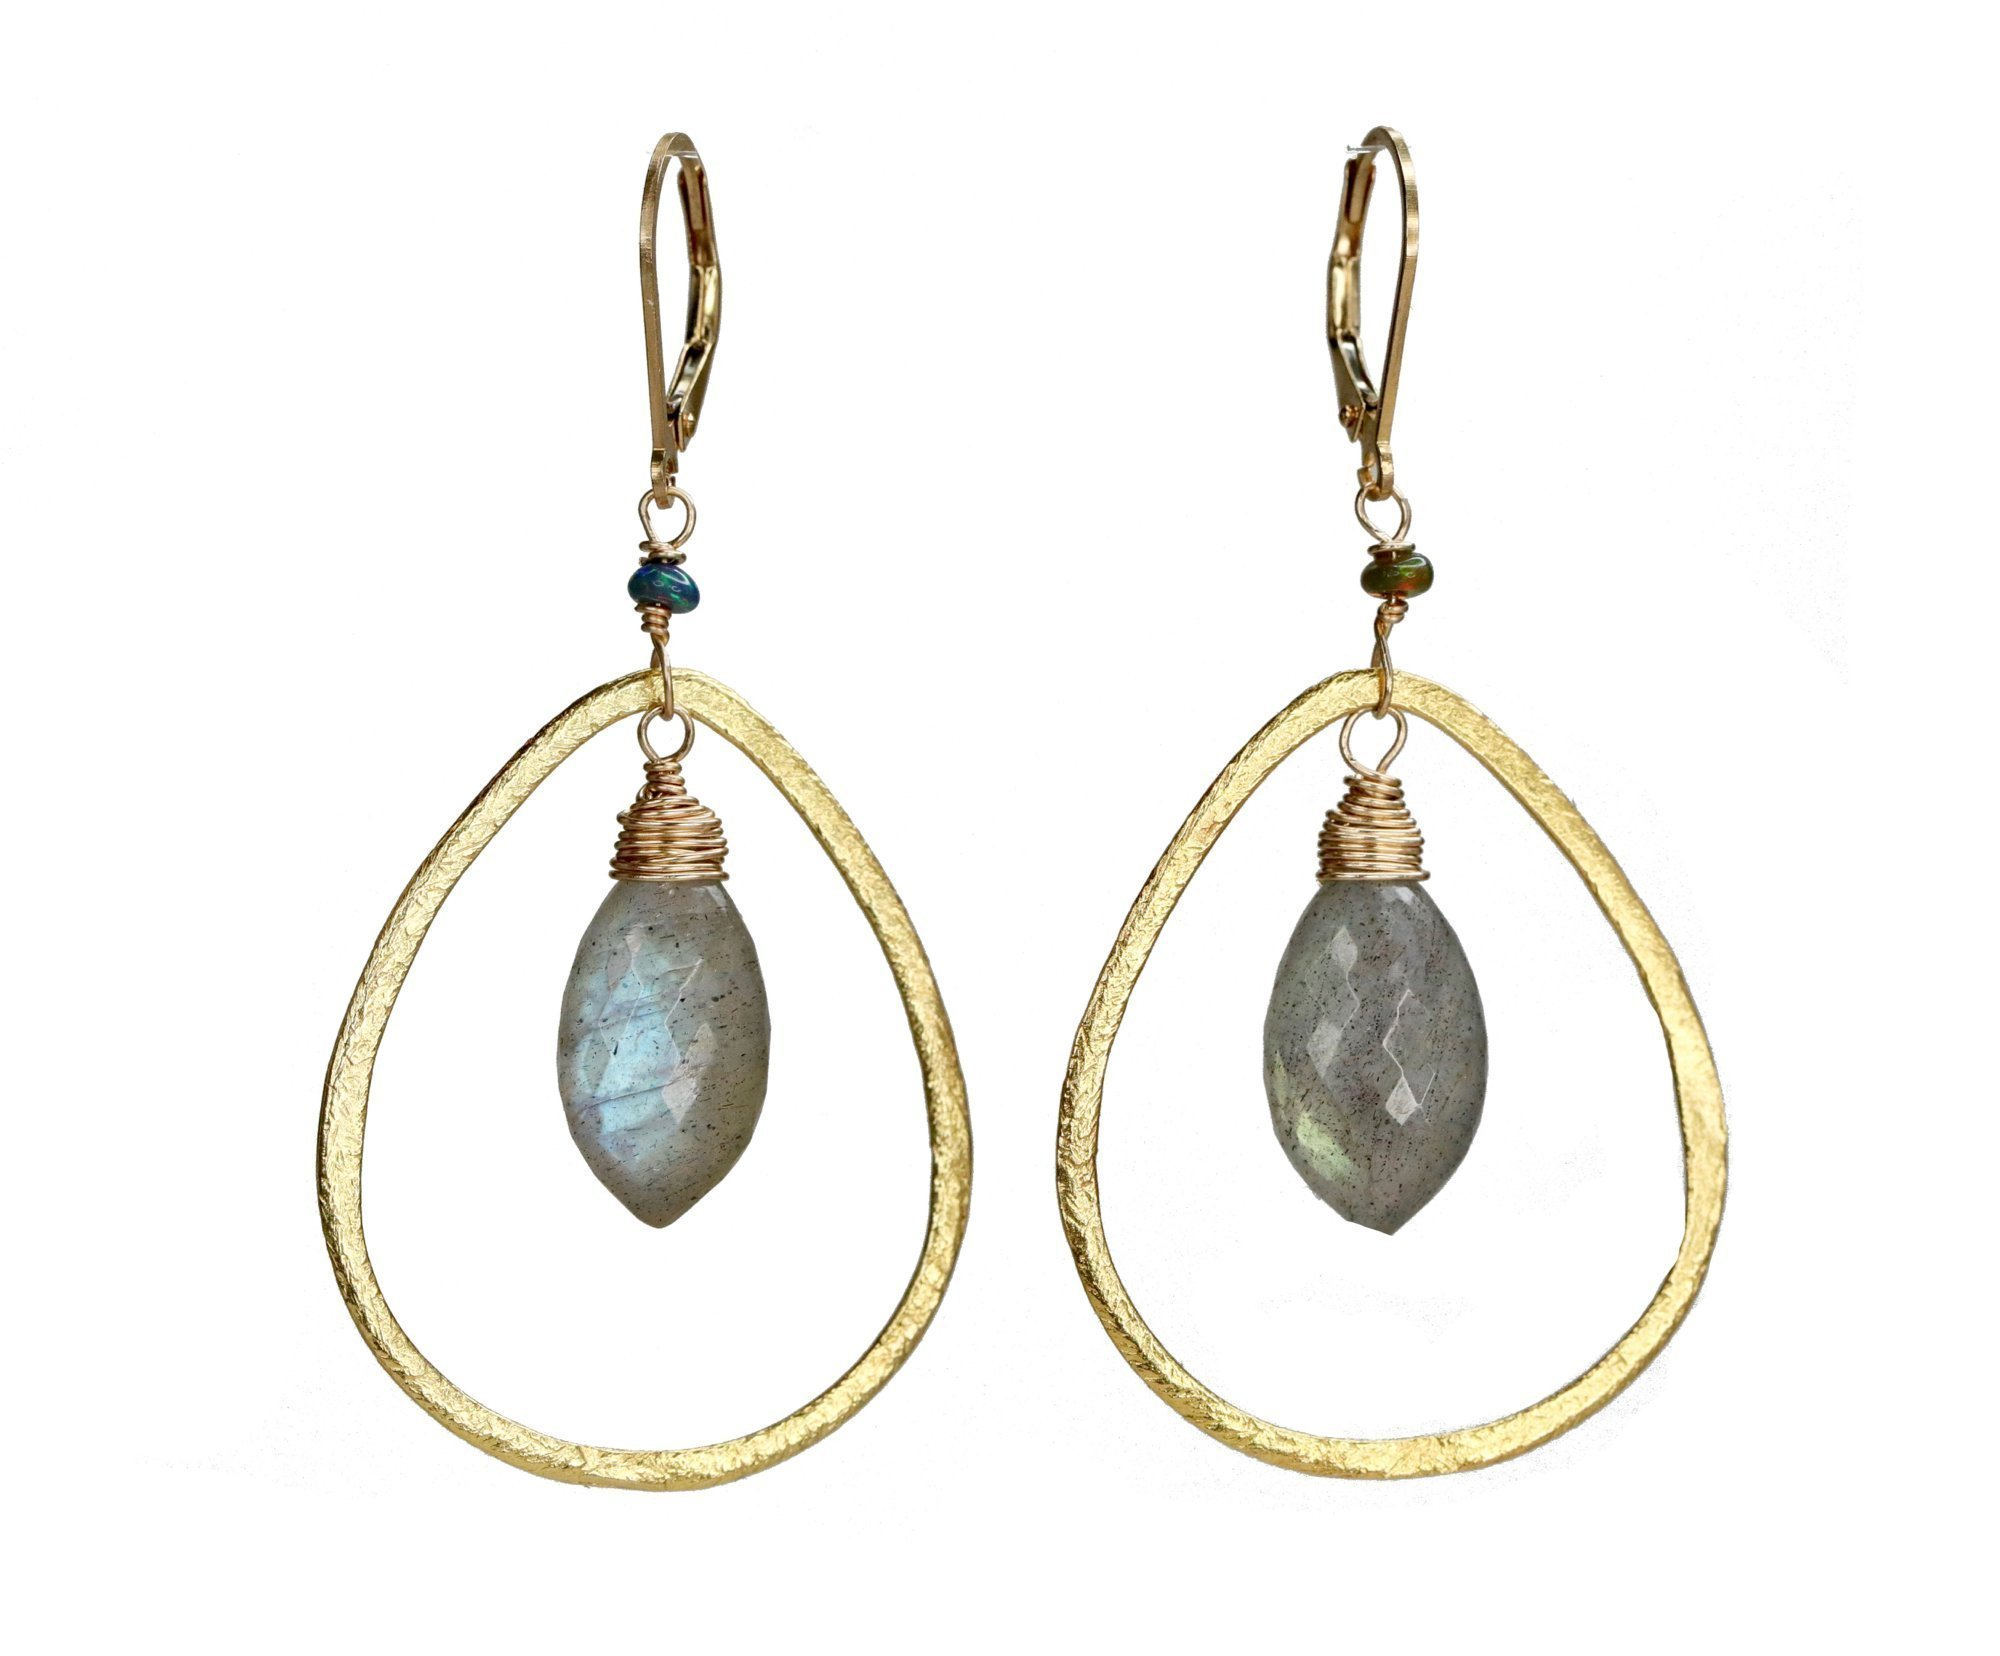 Gold Teardrop Hoop Chandelier Earrings Black Opal Labradorite Gemstone- 2.25'' Length